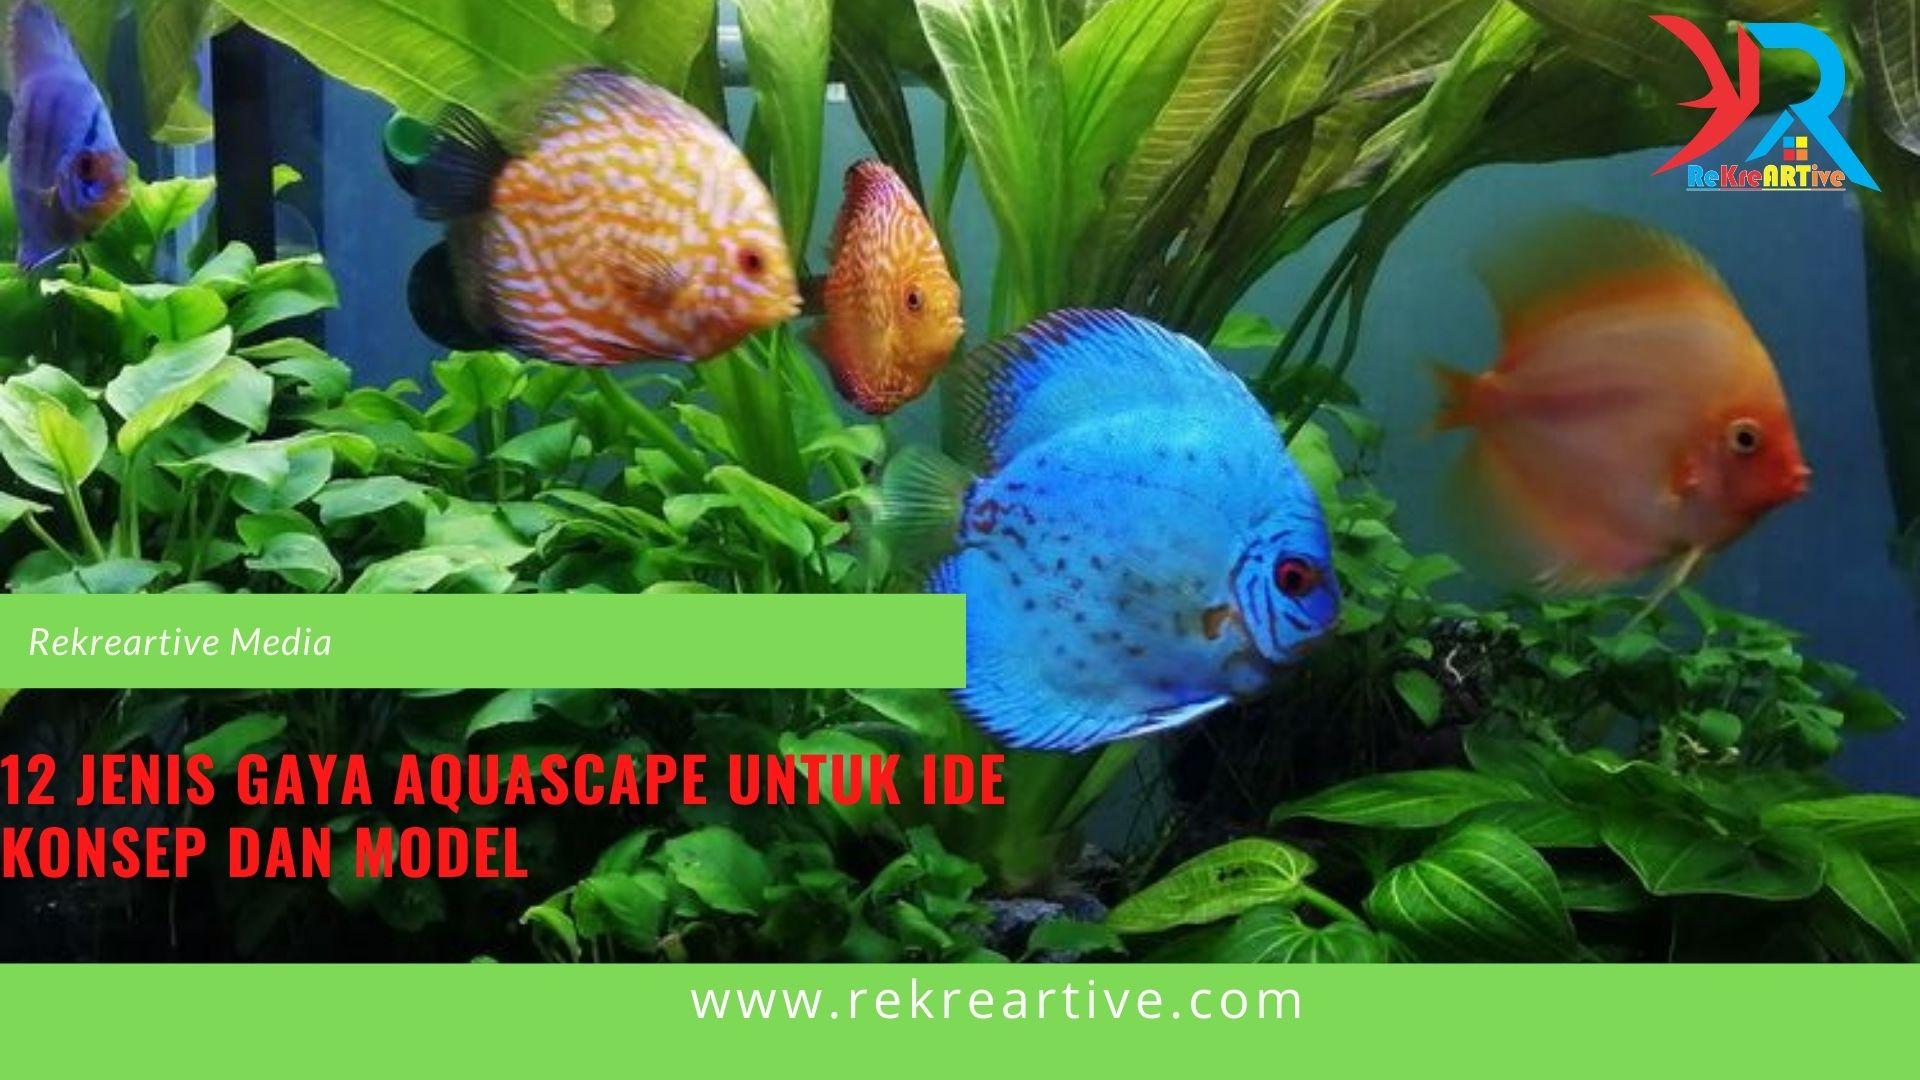 12 Jenis Gaya Aquascape Untuk Ide Konsep Dan Model Rekreartive